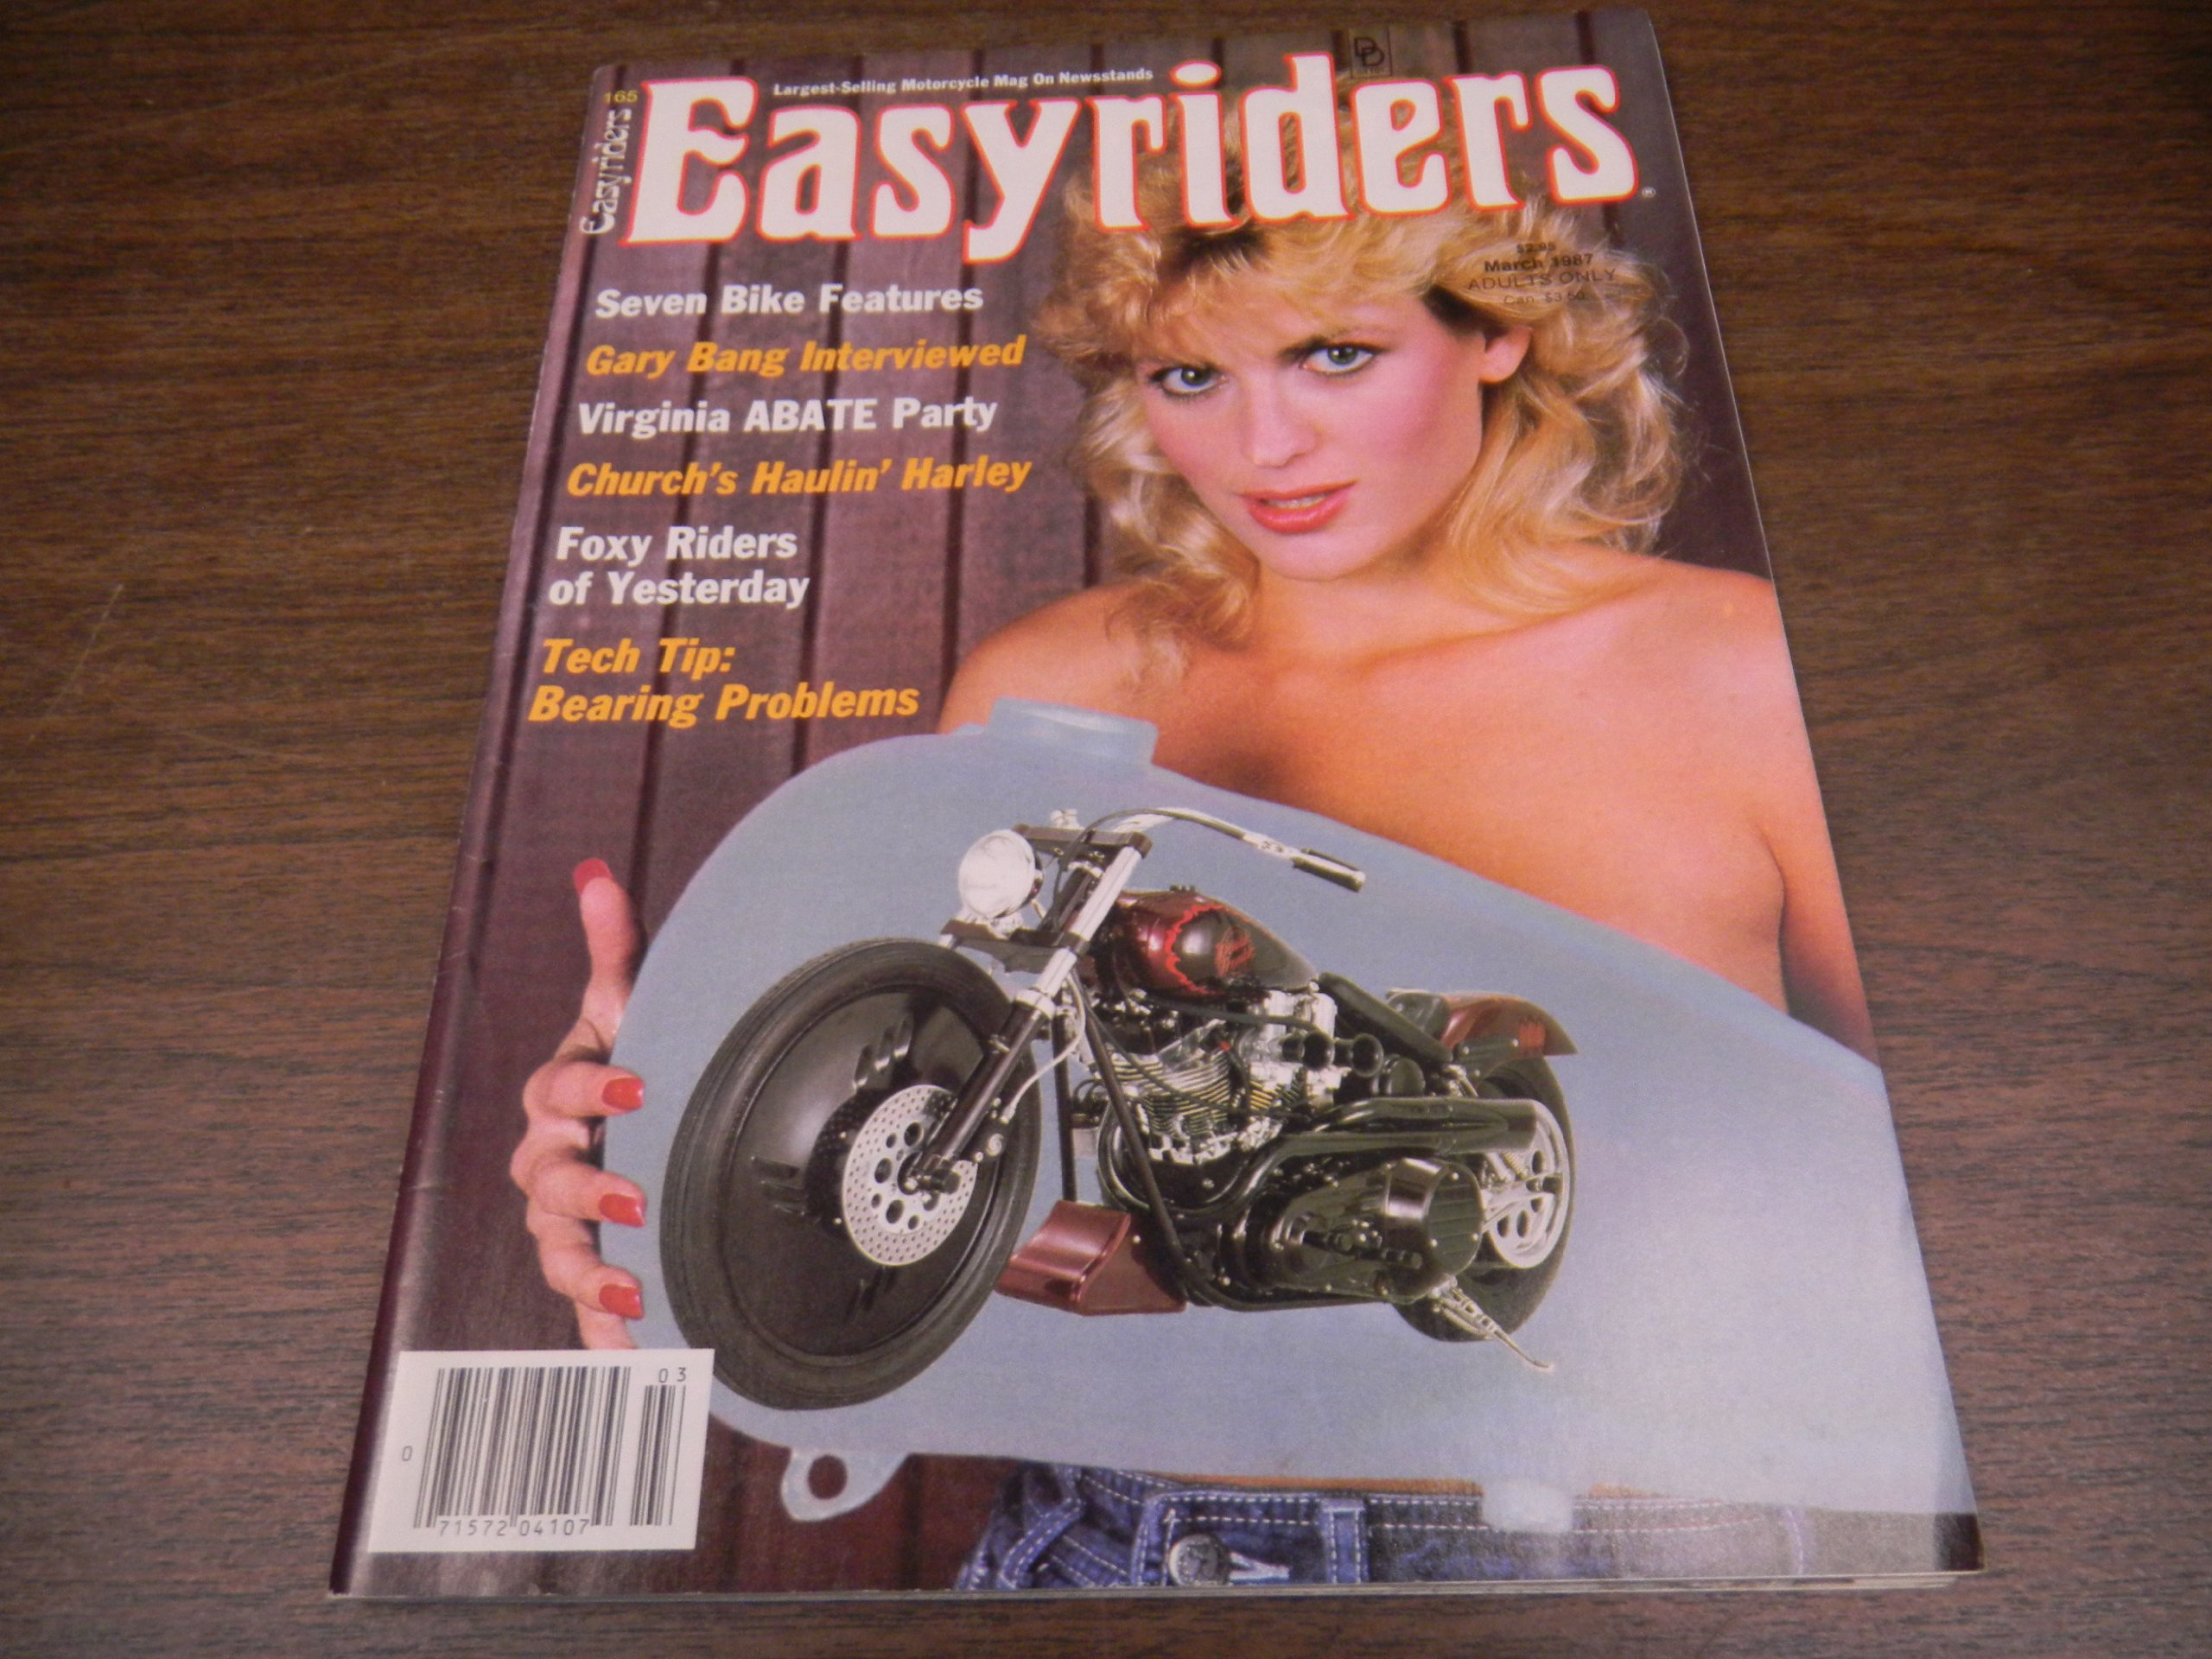 Easyriders Busty Adult Magazine